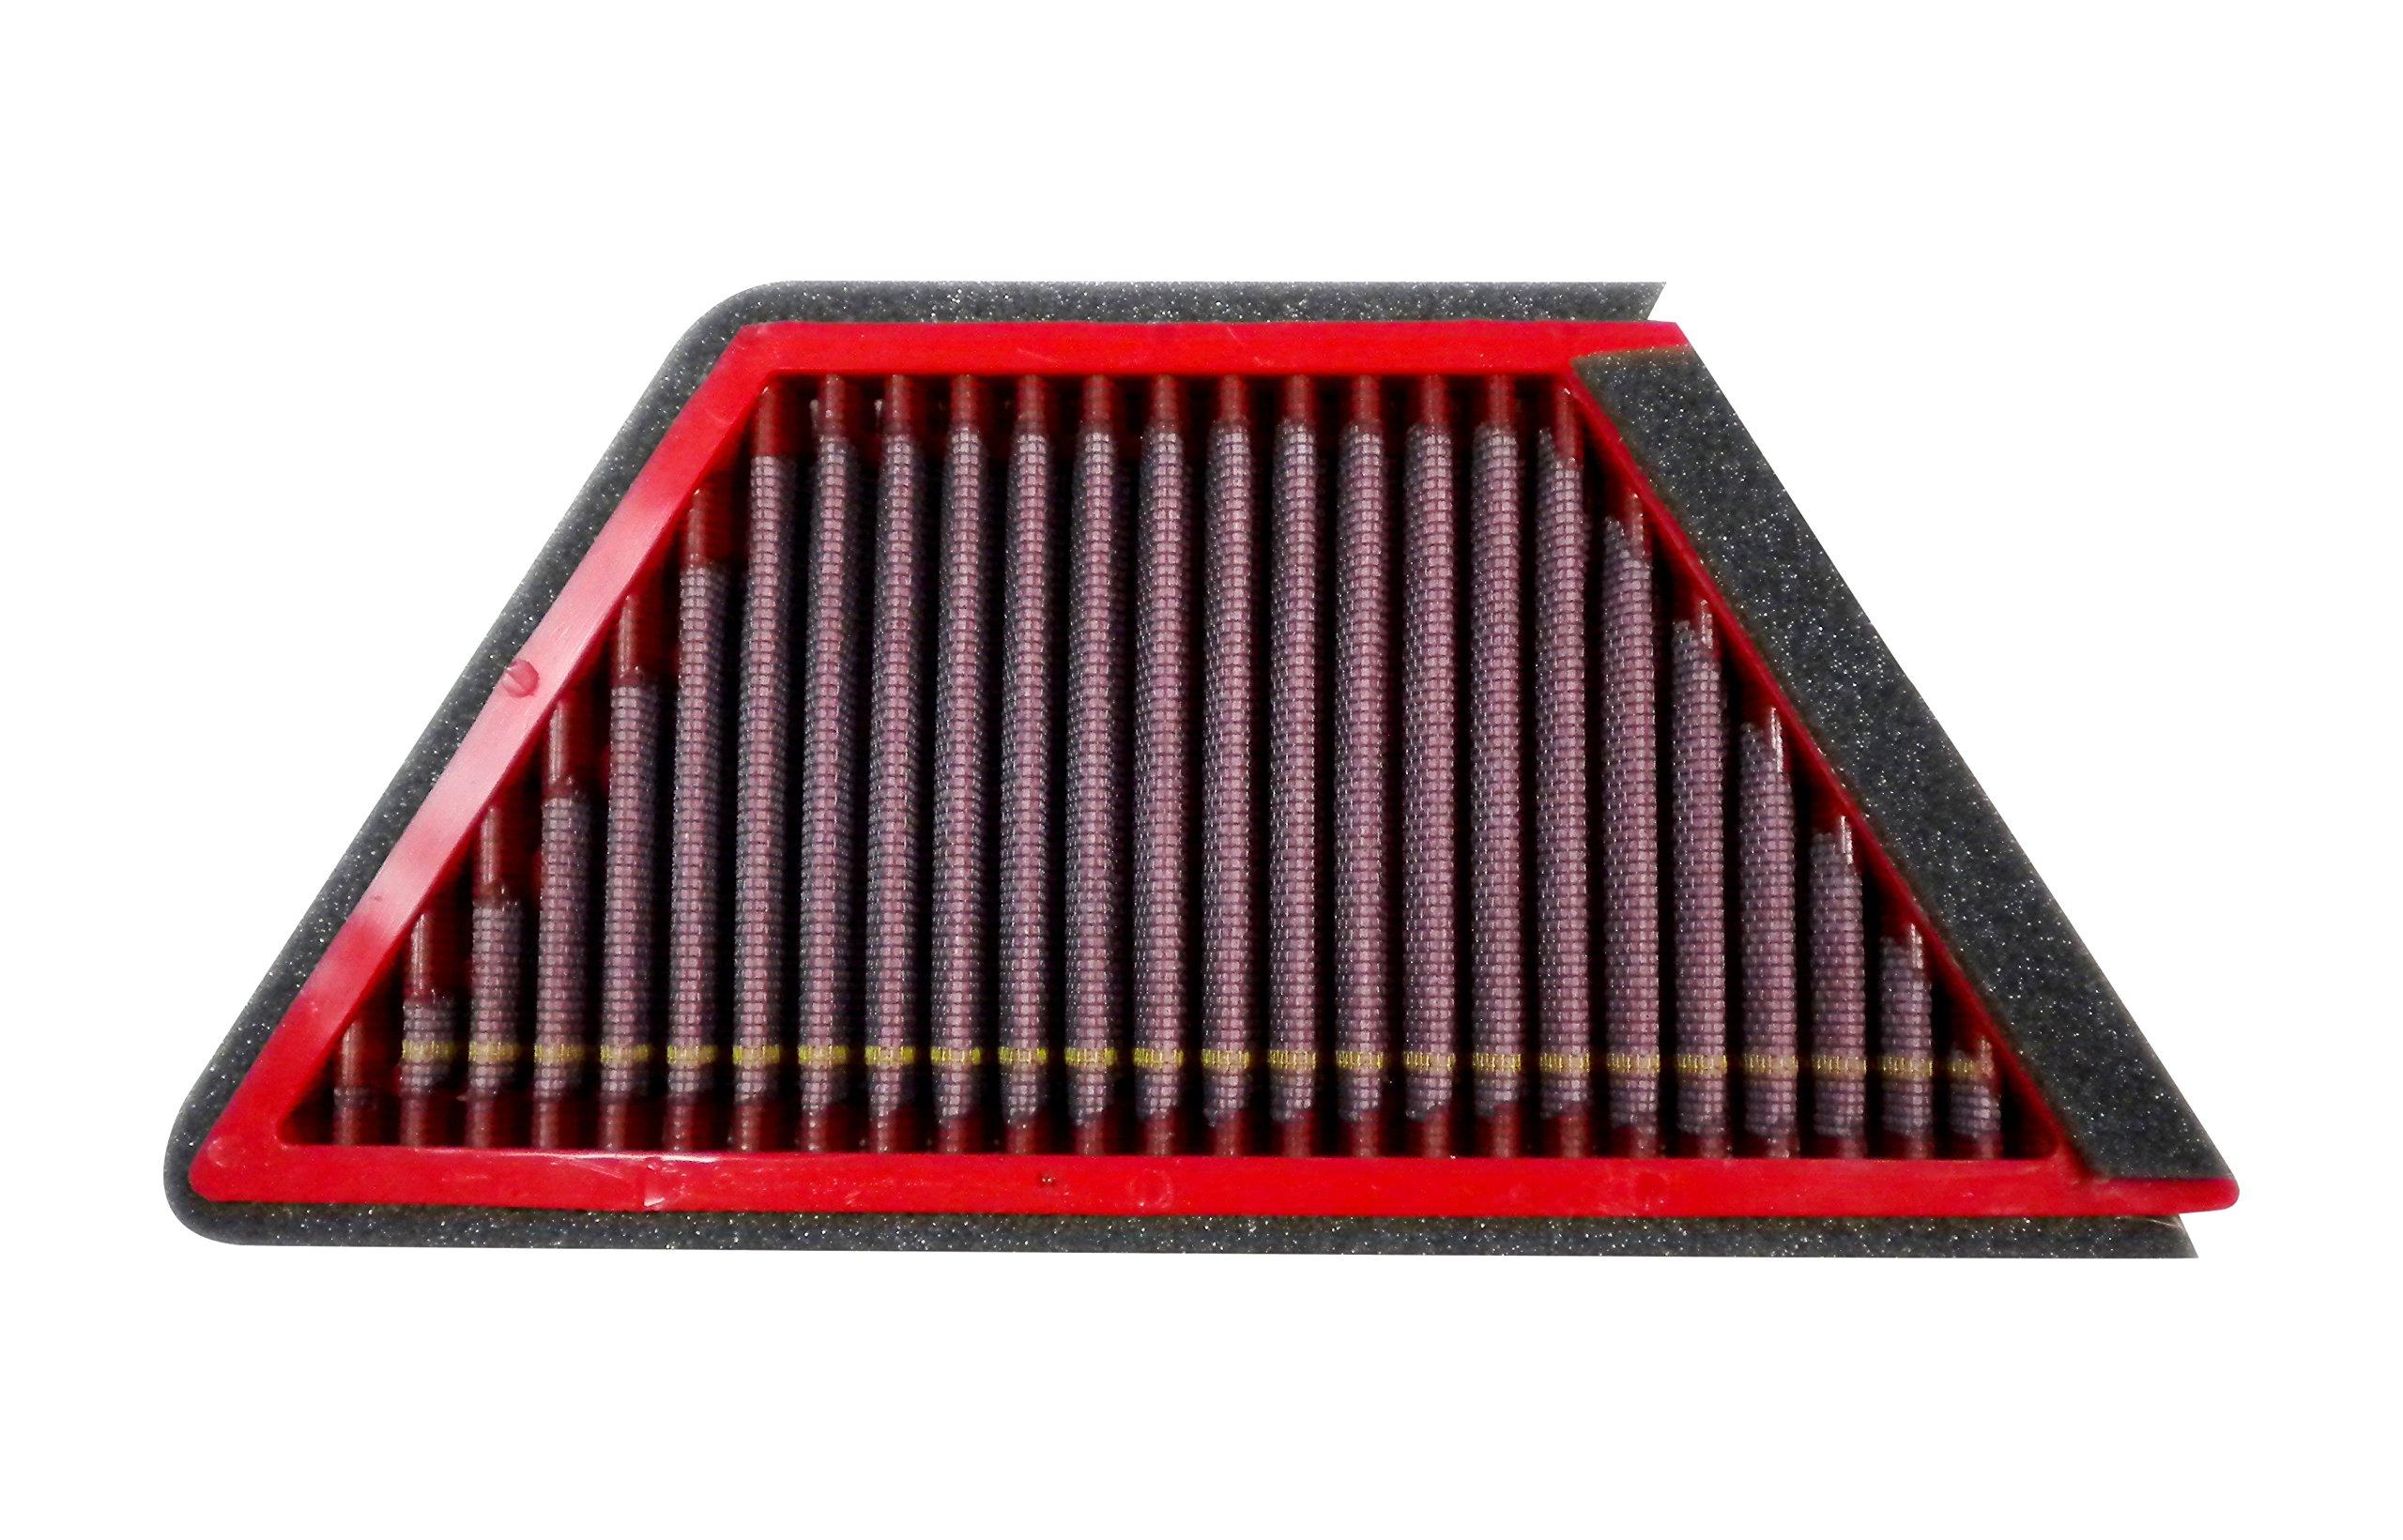 BMC FM466 / 04RACE Race Replacement Air Filter, Multi-Colour by BMC Air Filter